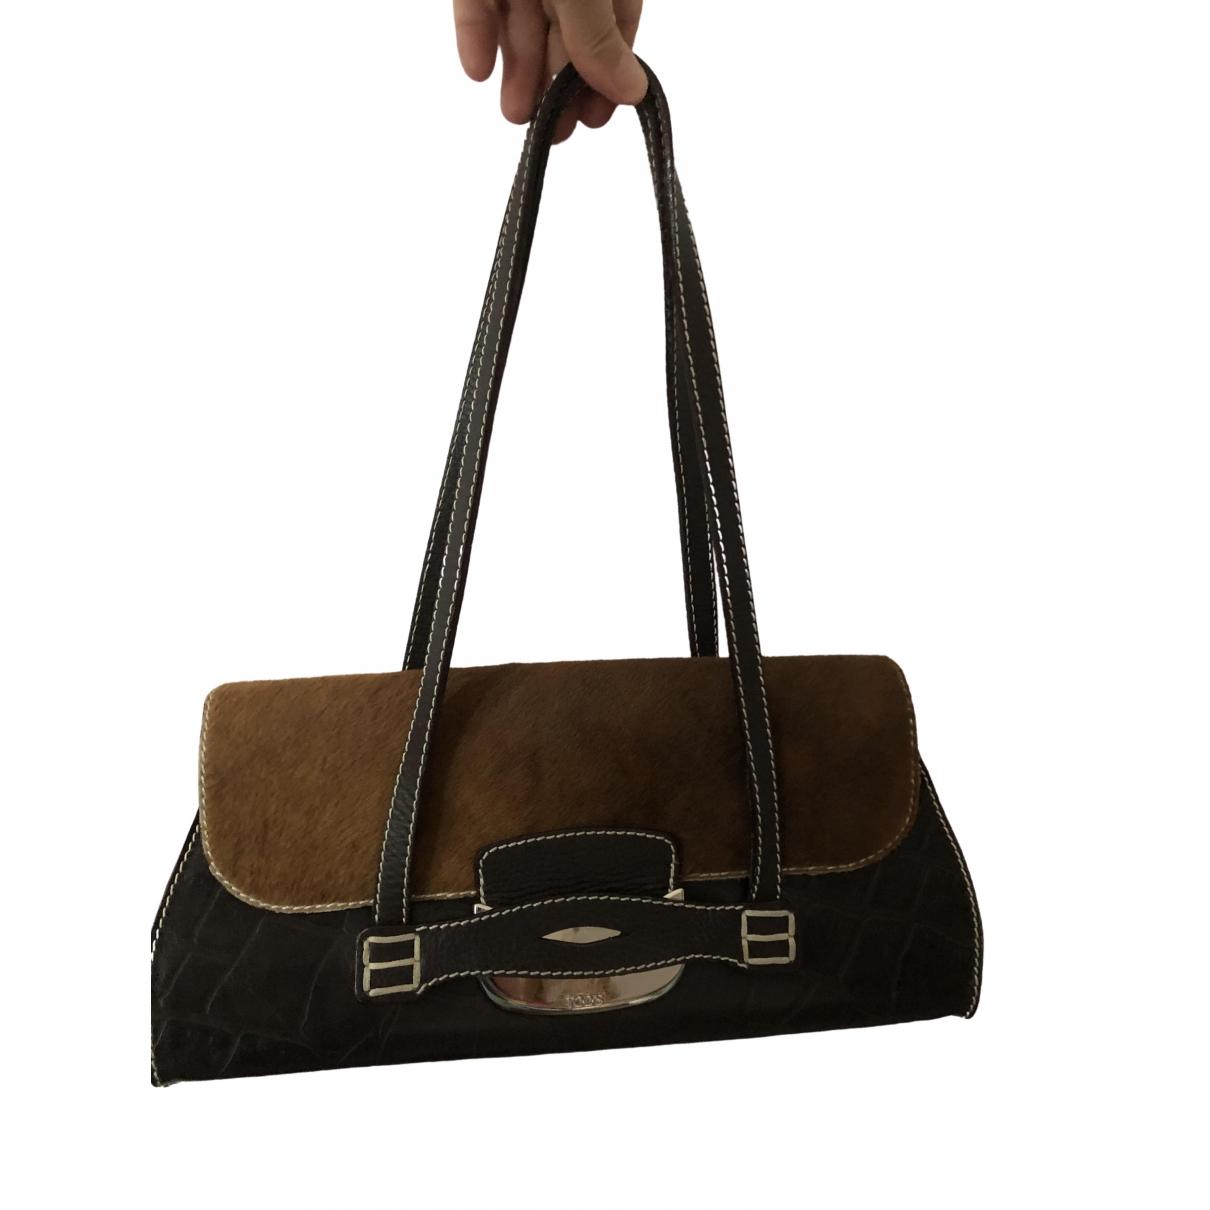 Tod's \N Beige Leather handbag for Women \N